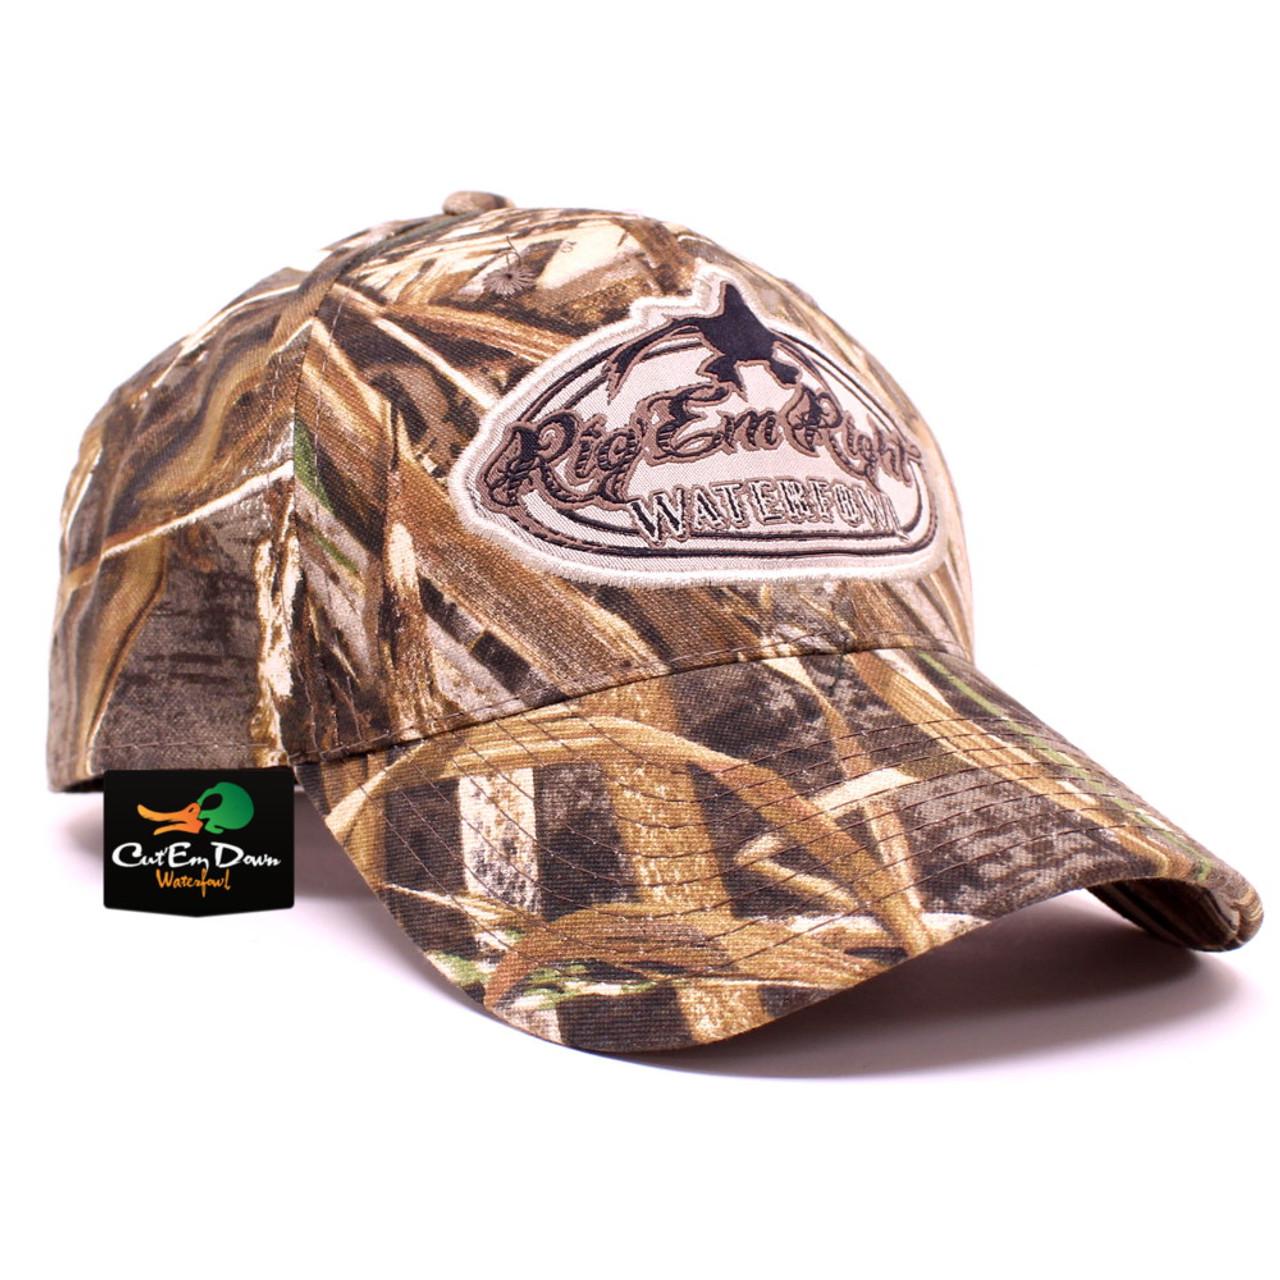 1eabbbccbc9 Rig Em Right Waterfowl Max-5 Camo Hat